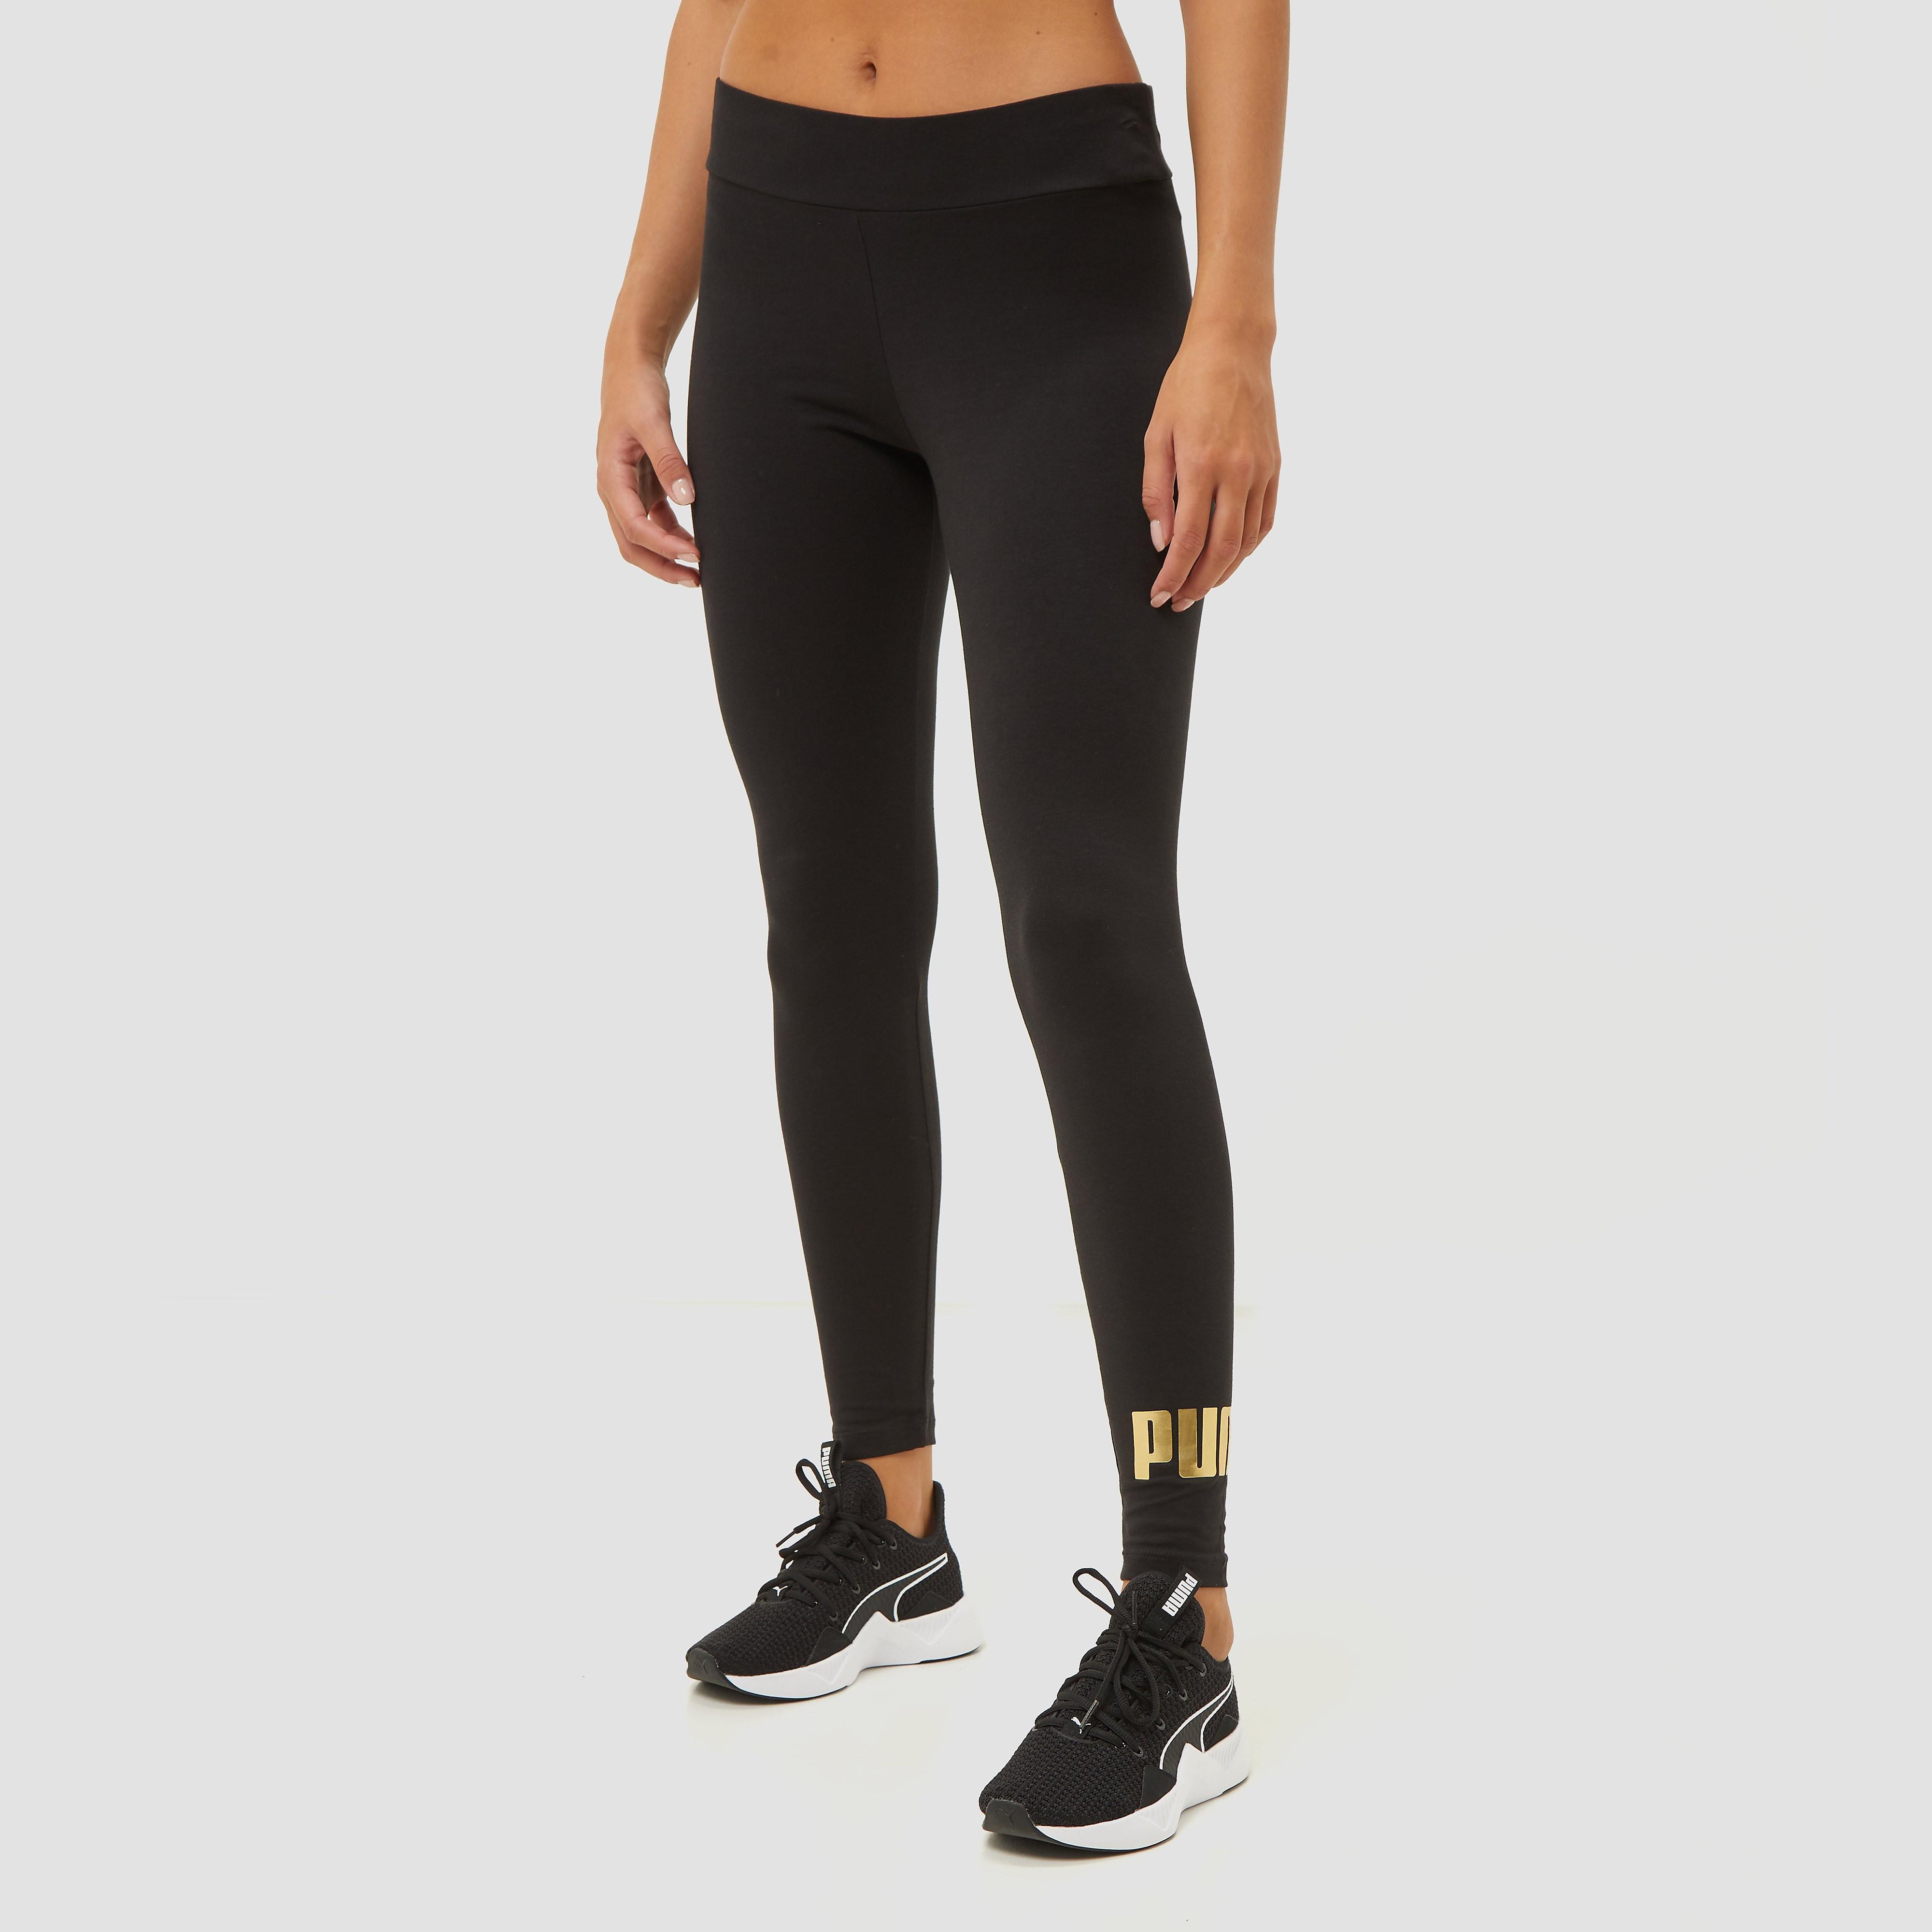 Puma Puma essentials+ metallic legging zwart/goud dames dames